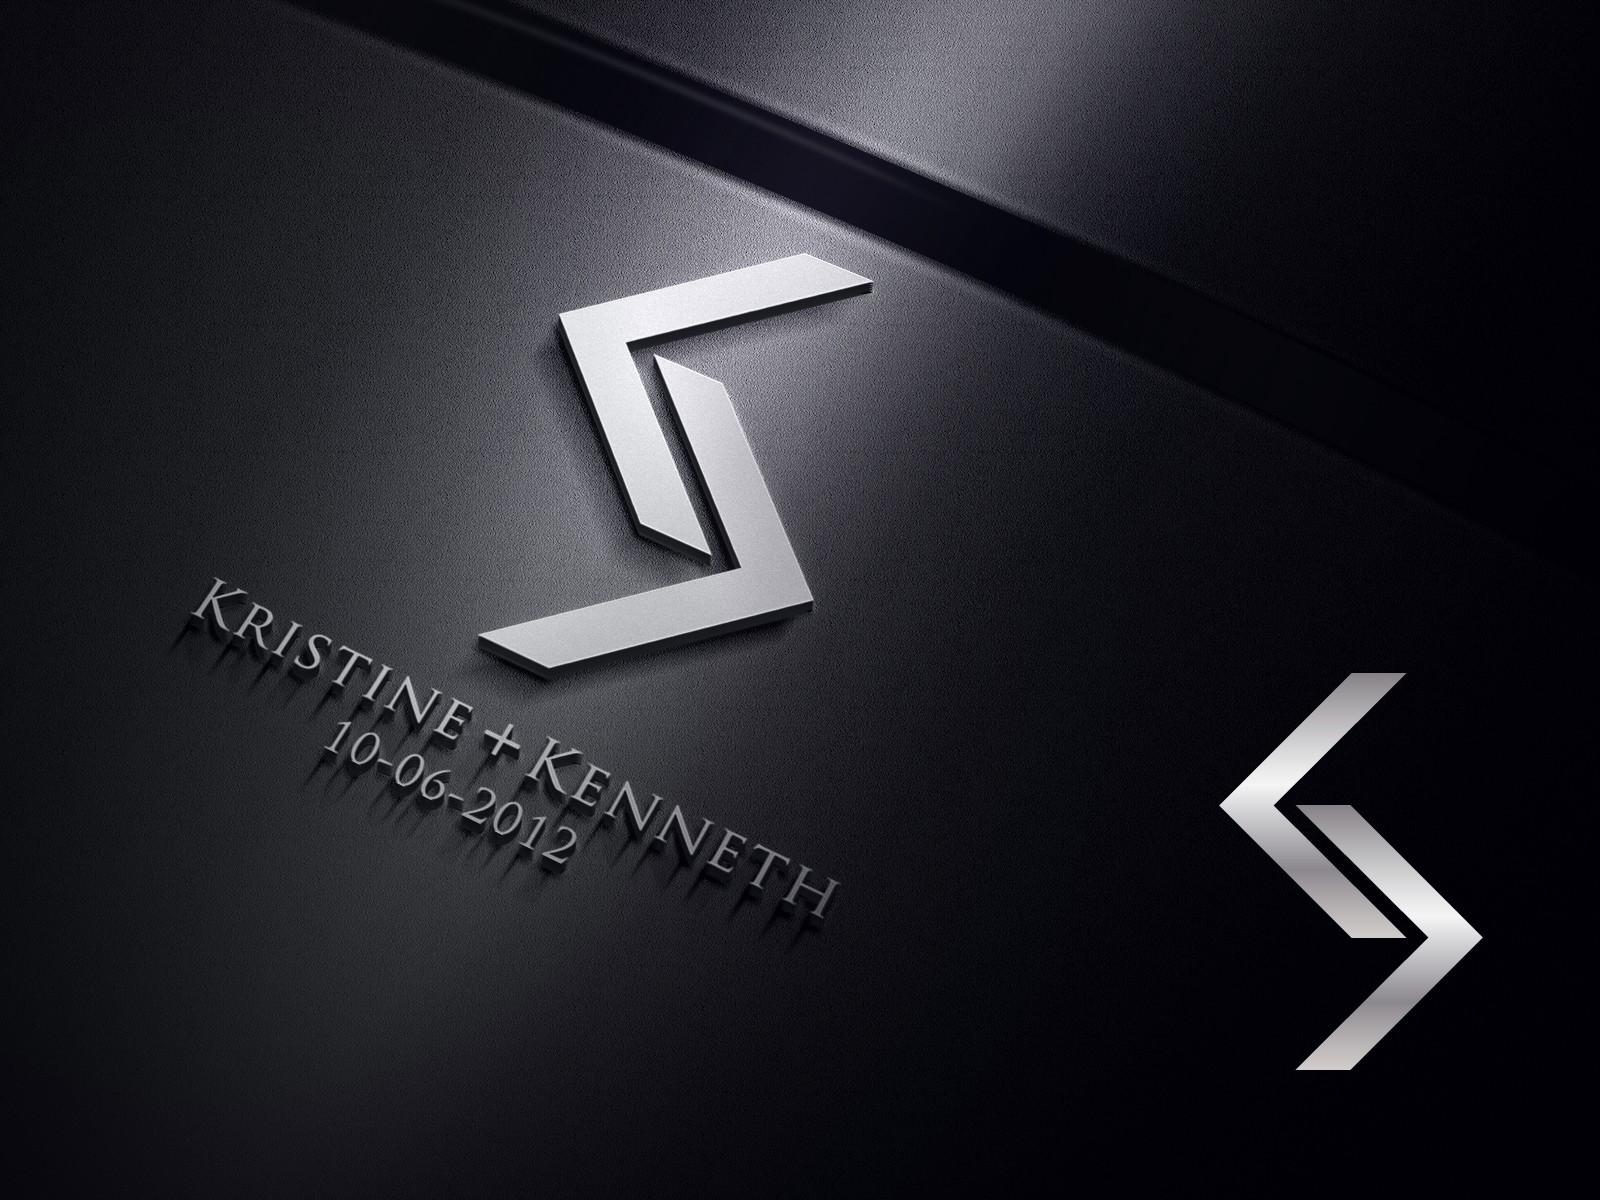 Help Kristine  Kenneth   10-06-2012      with a new logo